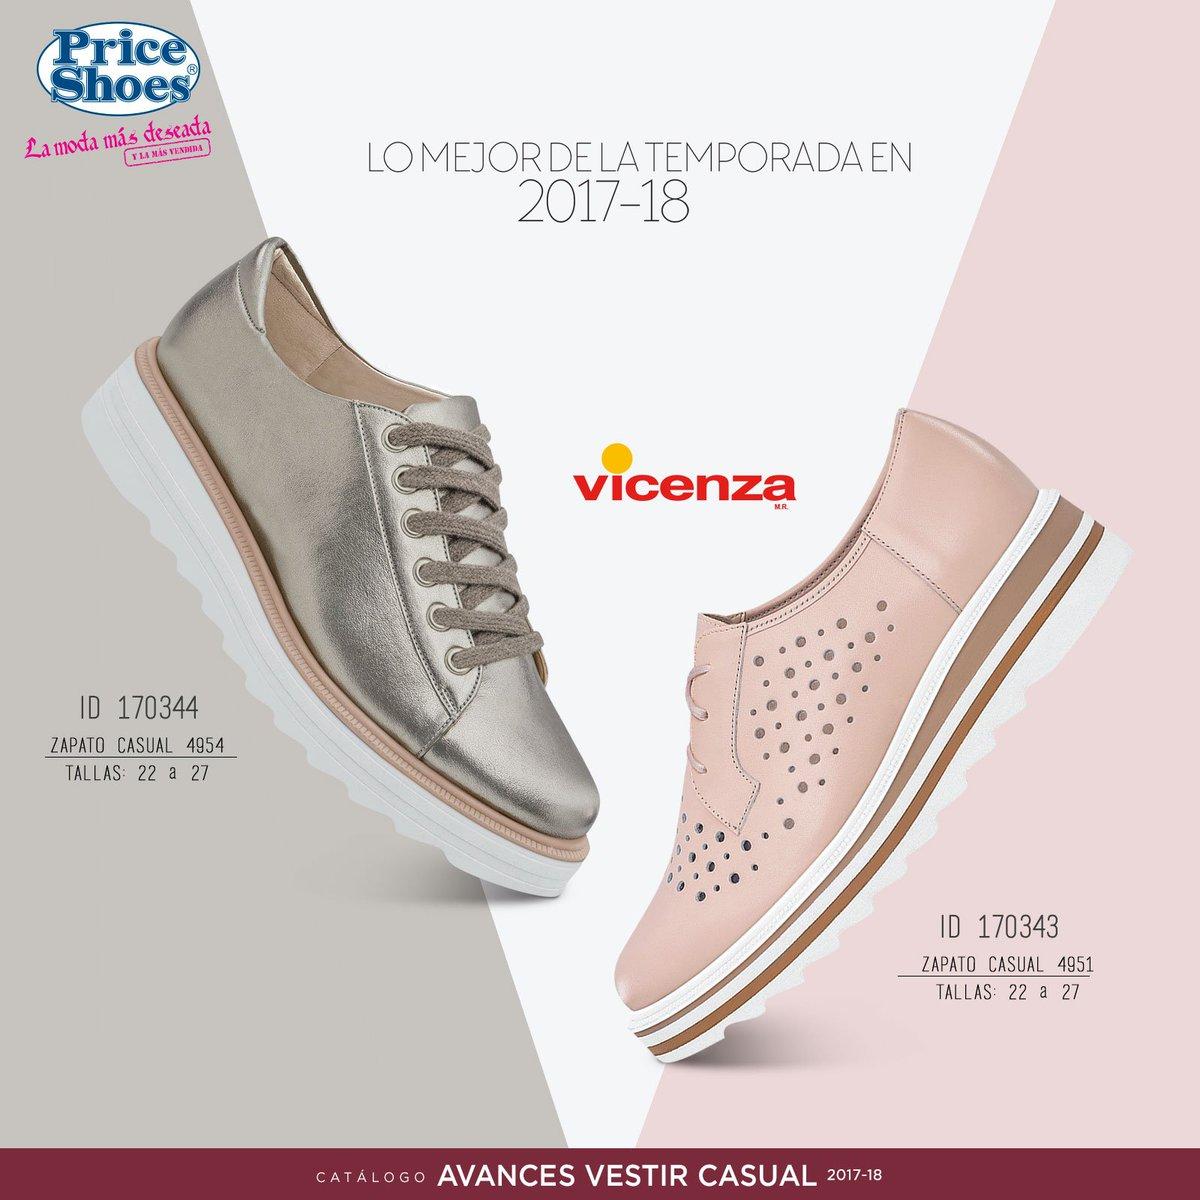 356b4de977 Price Shoes on Twitter